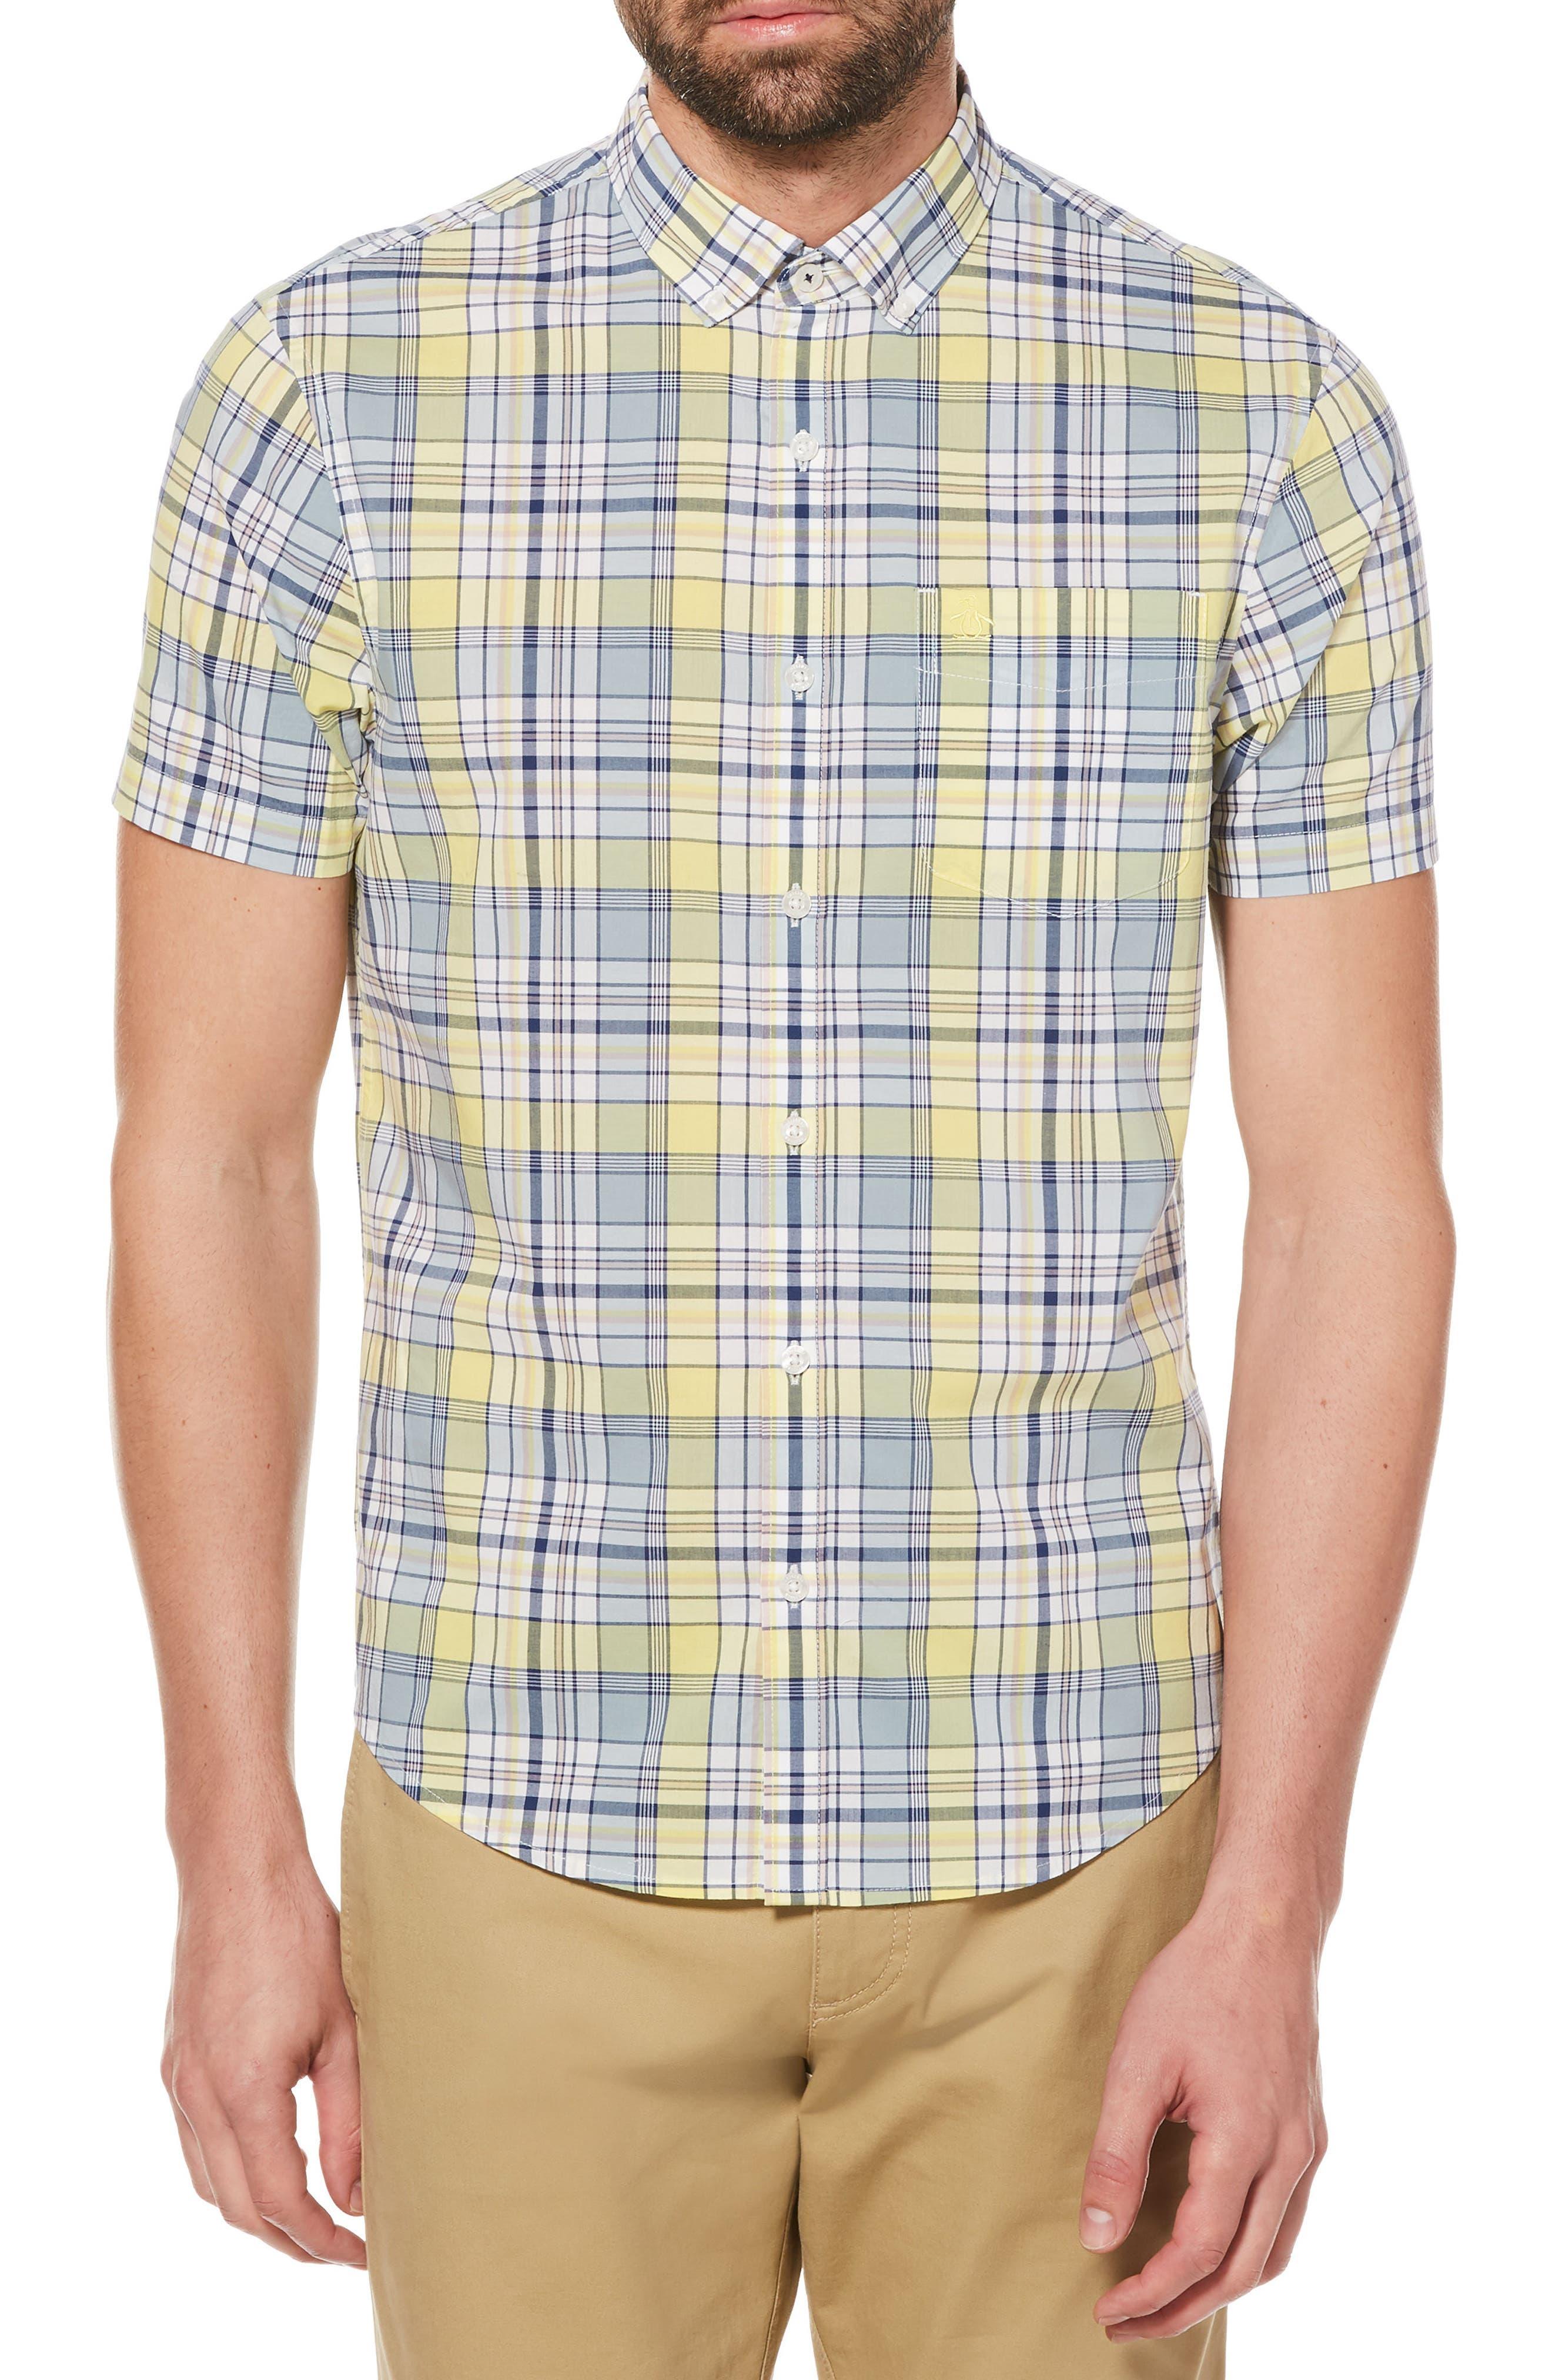 P55 Woven Shirt,                         Main,                         color, Limelight